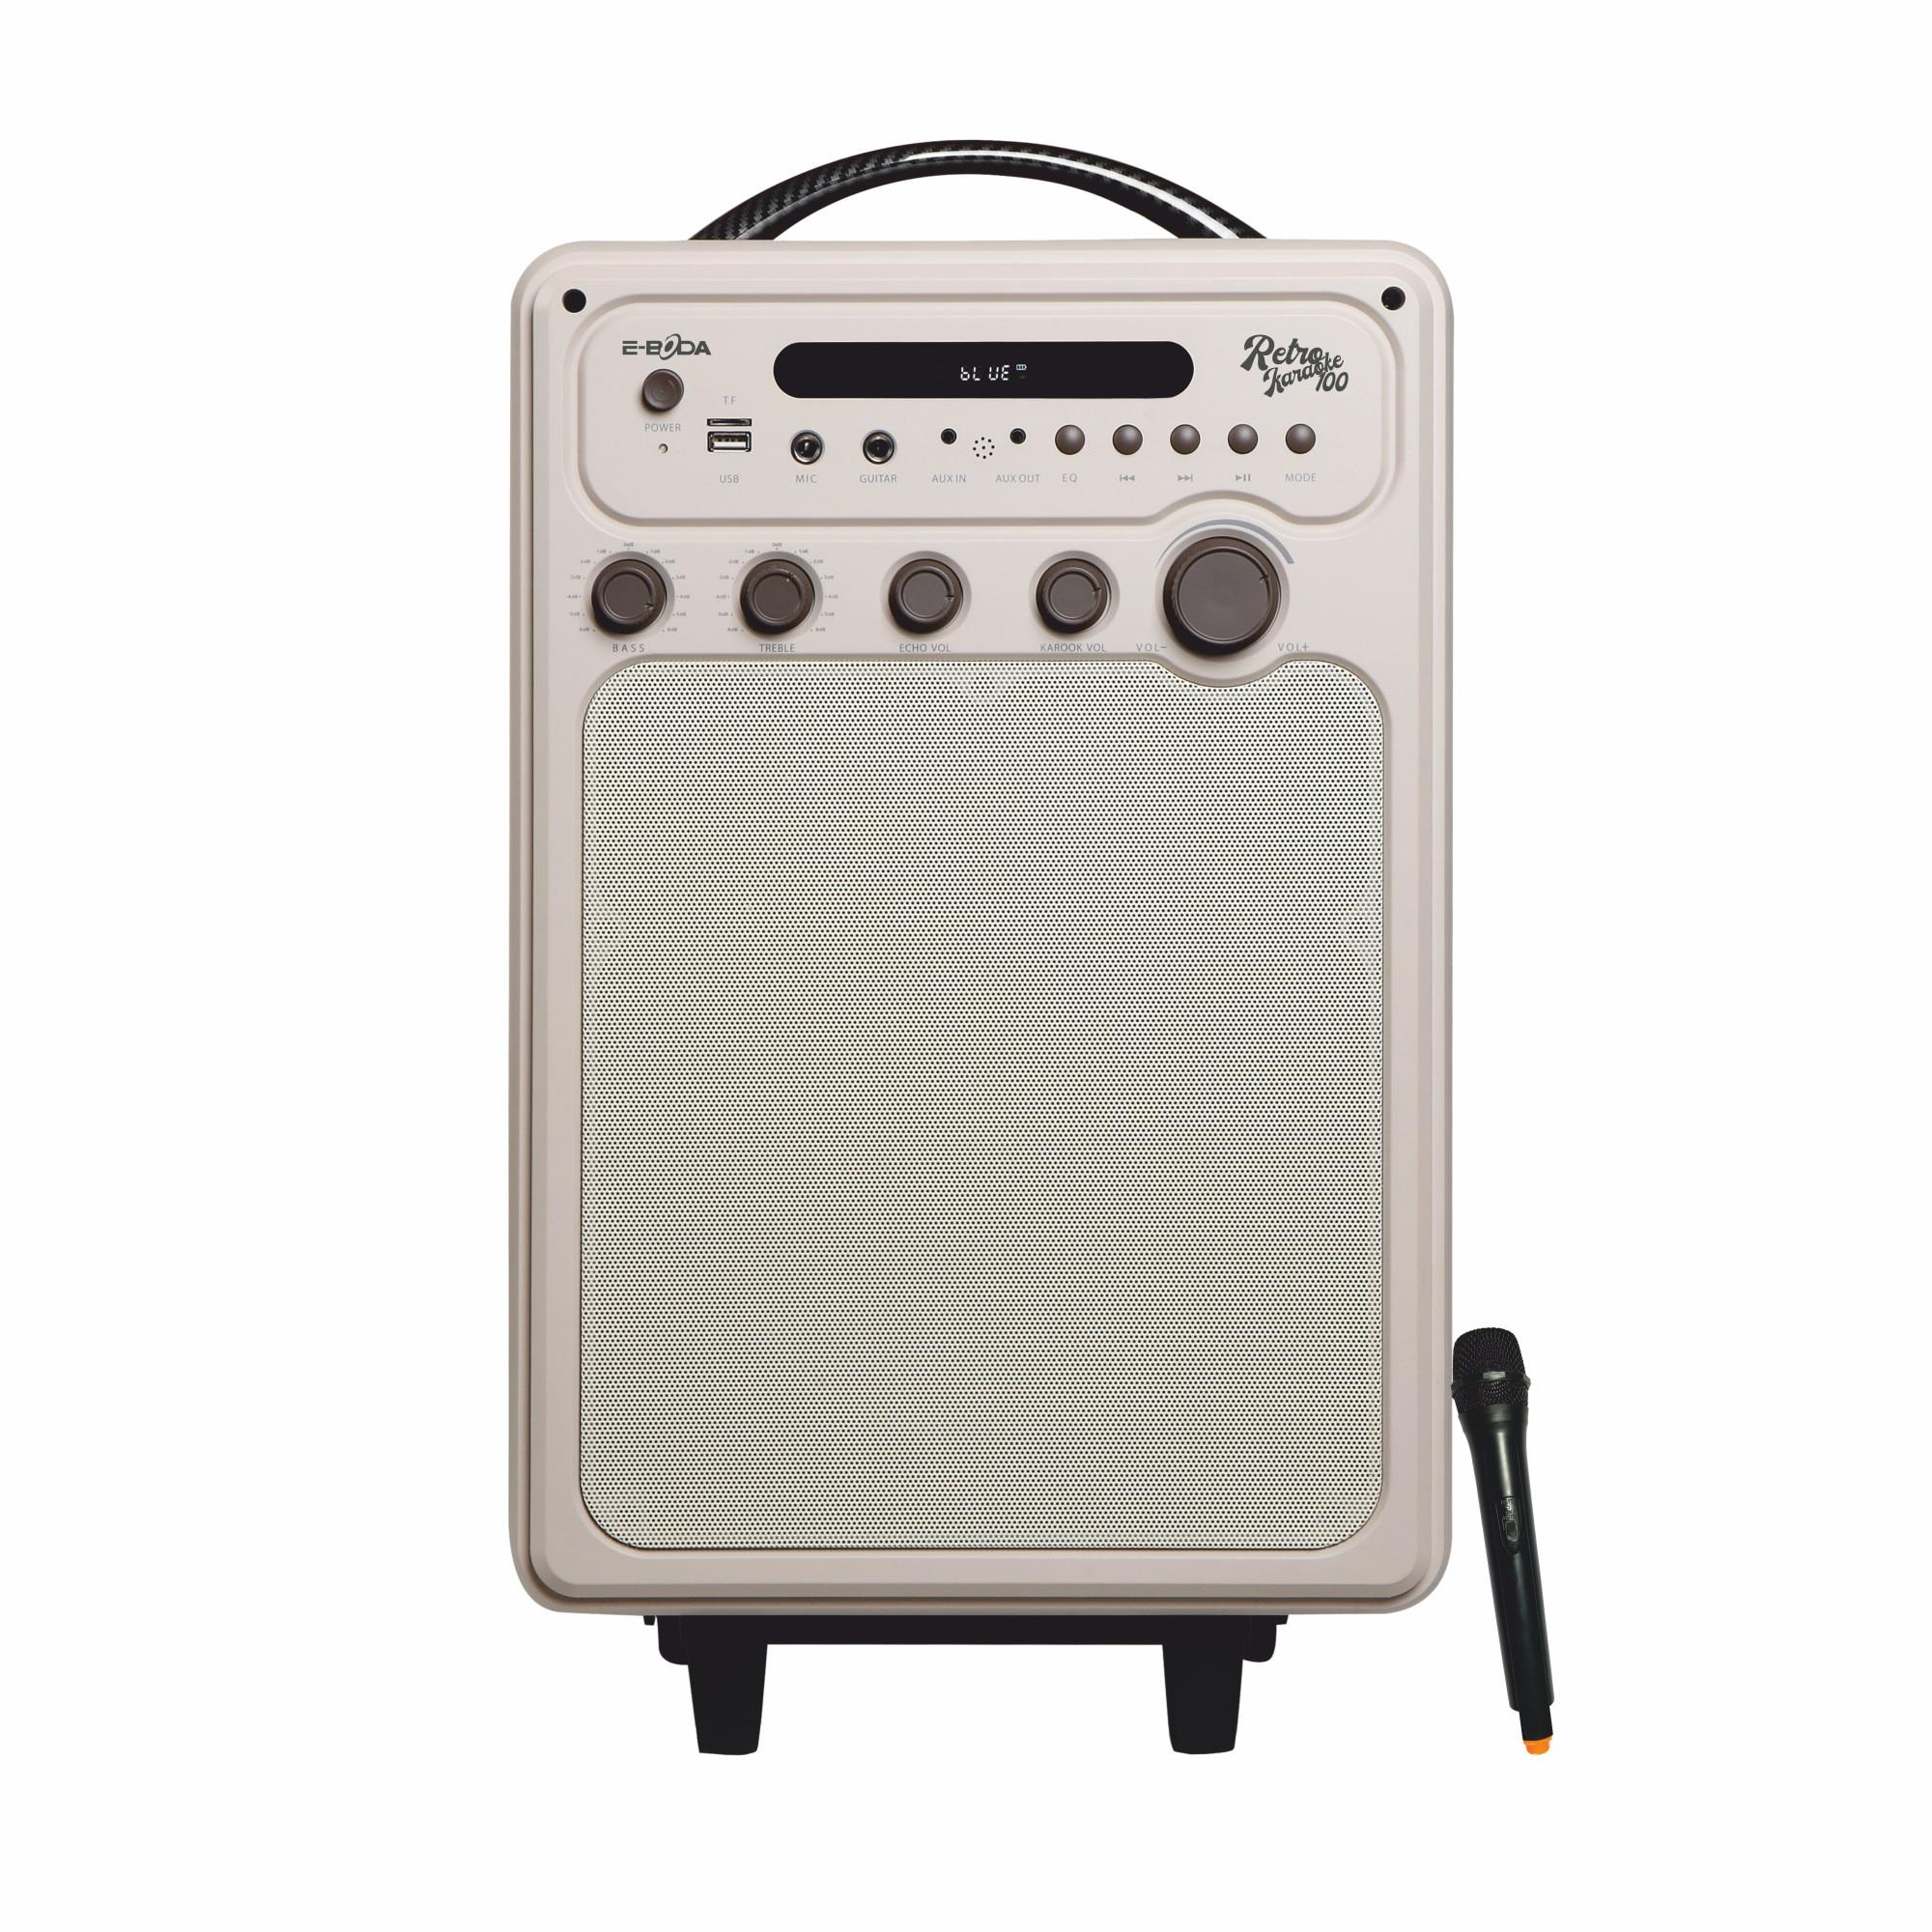 Fotografie Boxa portabila E-BODA Retro Karaoke 100